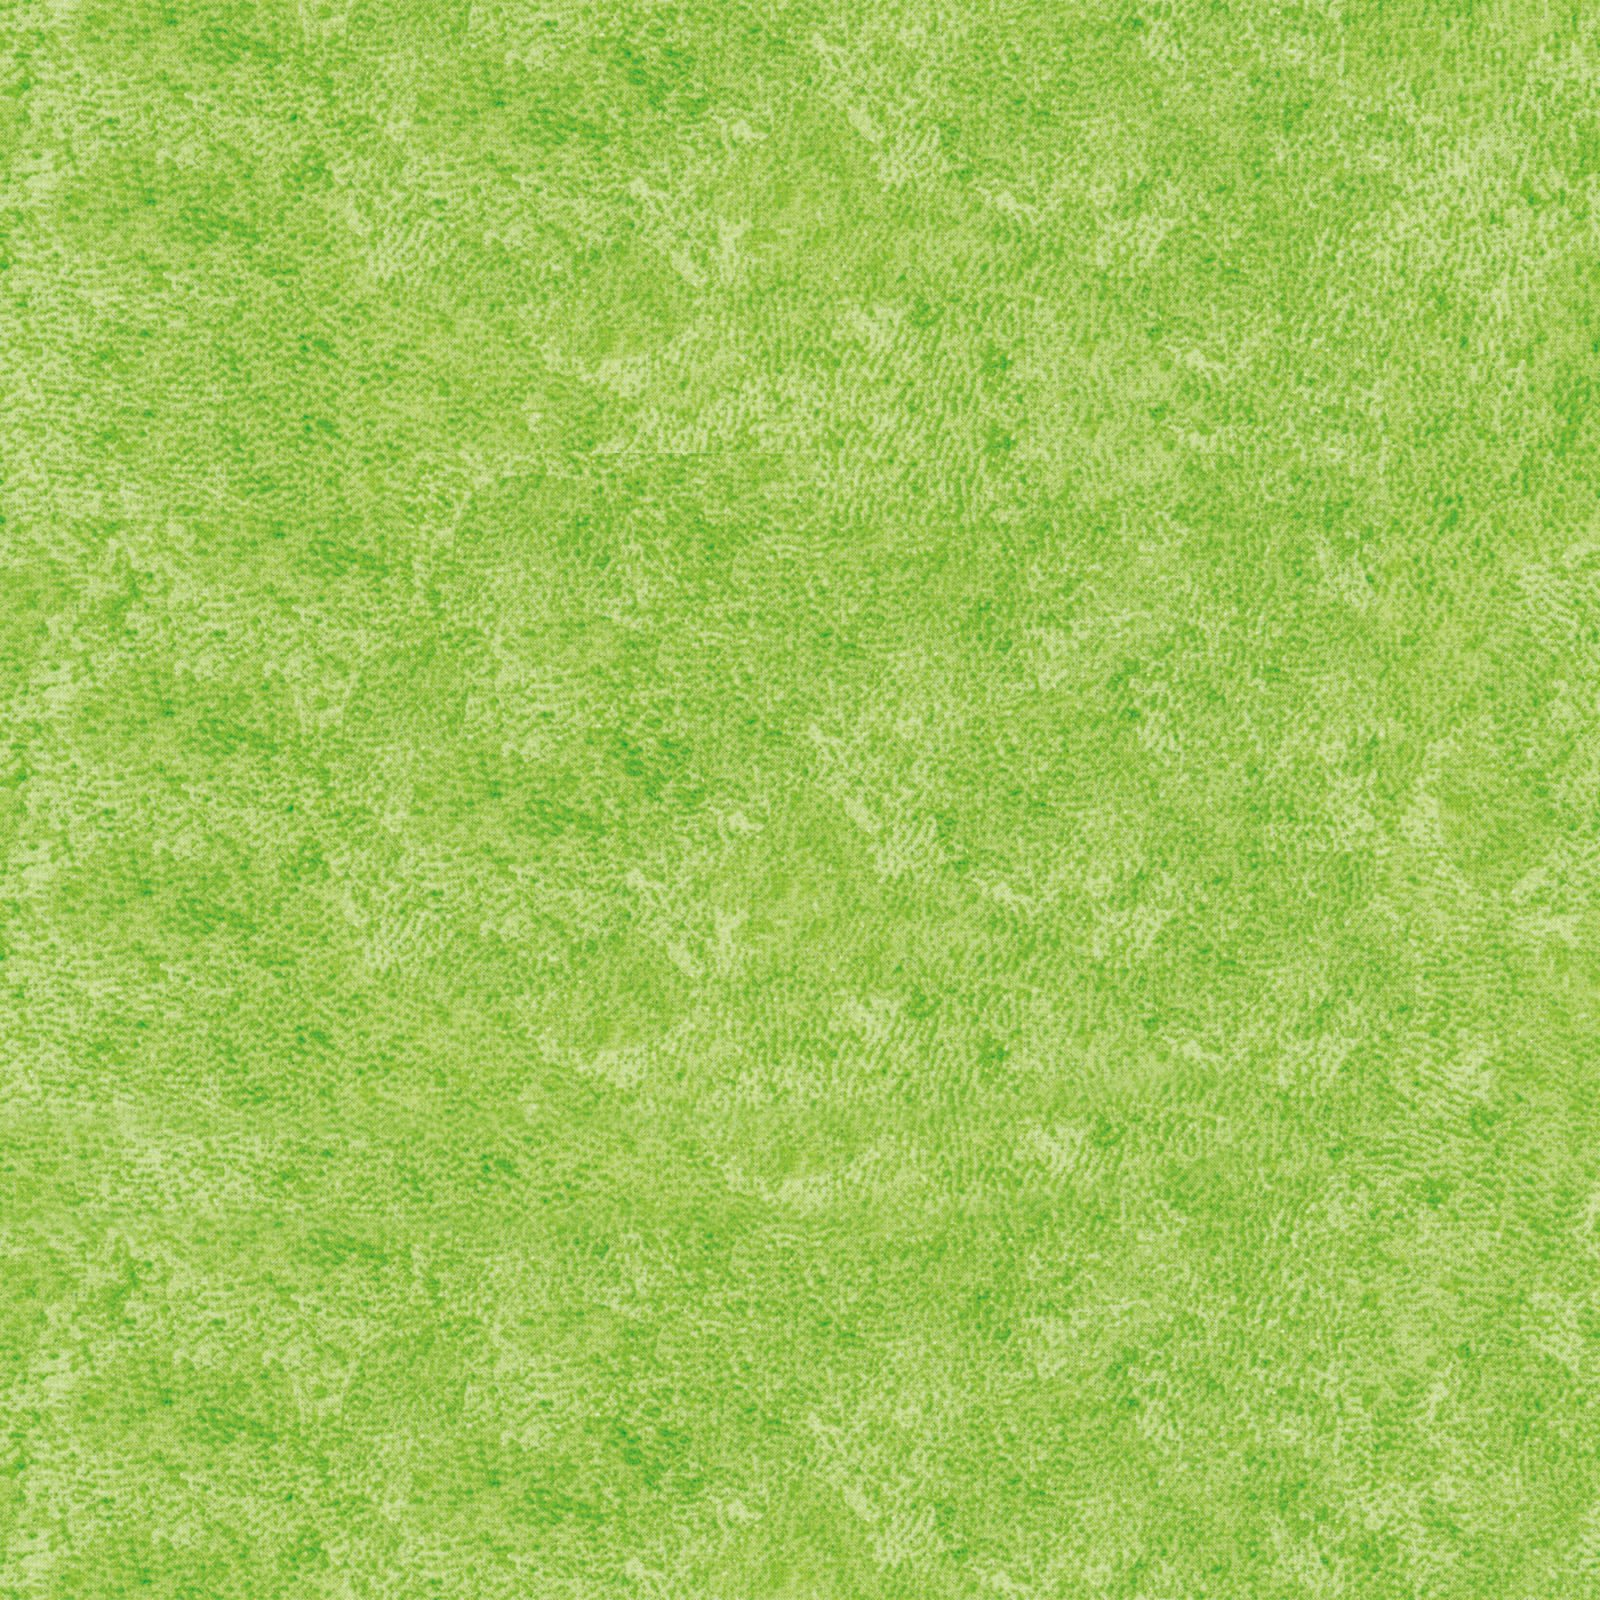 D c fix klebefolie gr n deko 45x200 cm dekor - Klebefolie fur wand ...